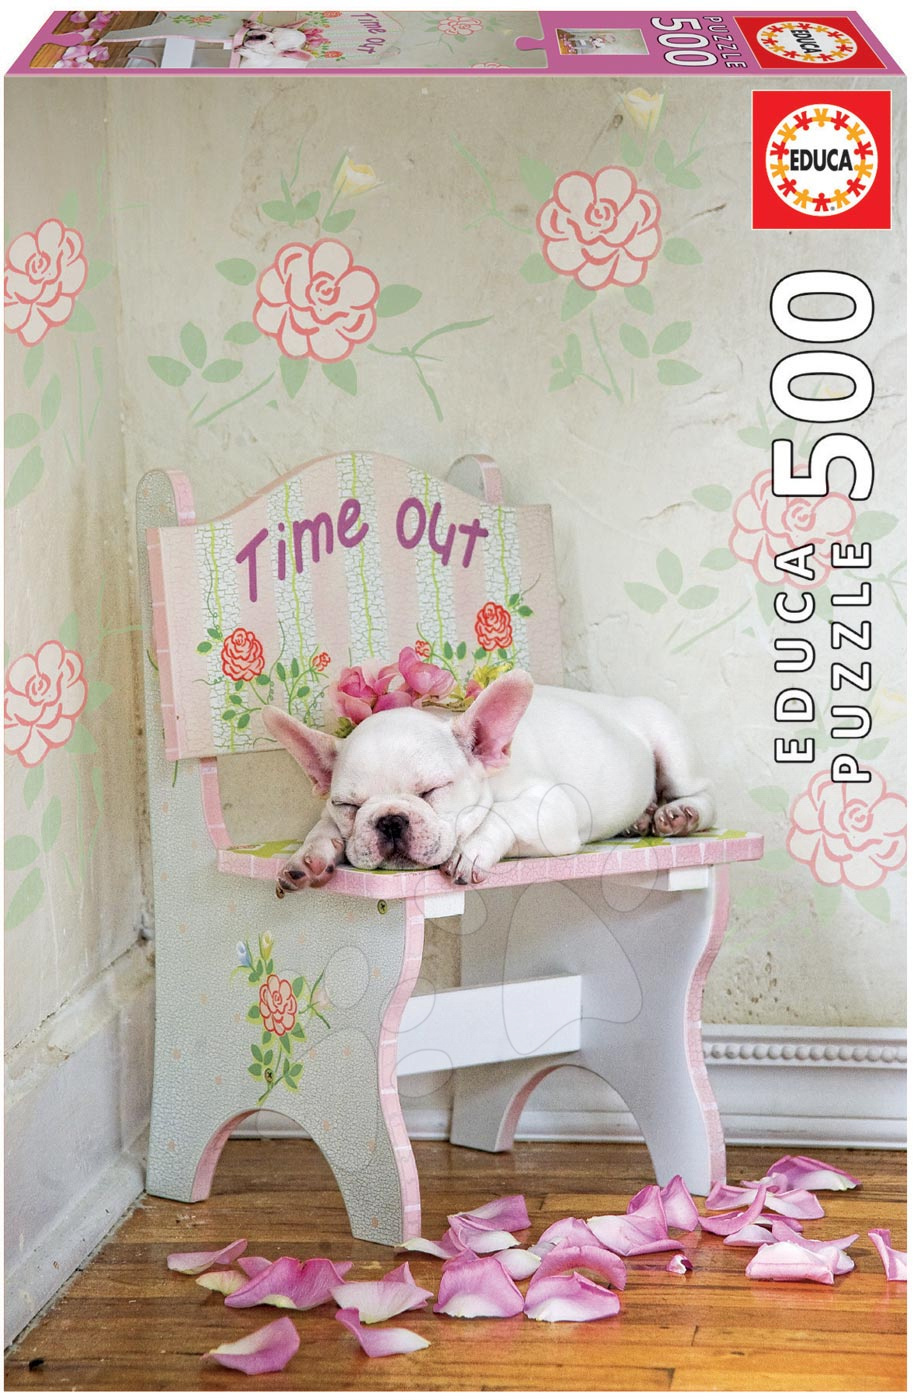 Puzzle Genuine Taking time out, Lisa Jane Educa 500 dílů od 11 let